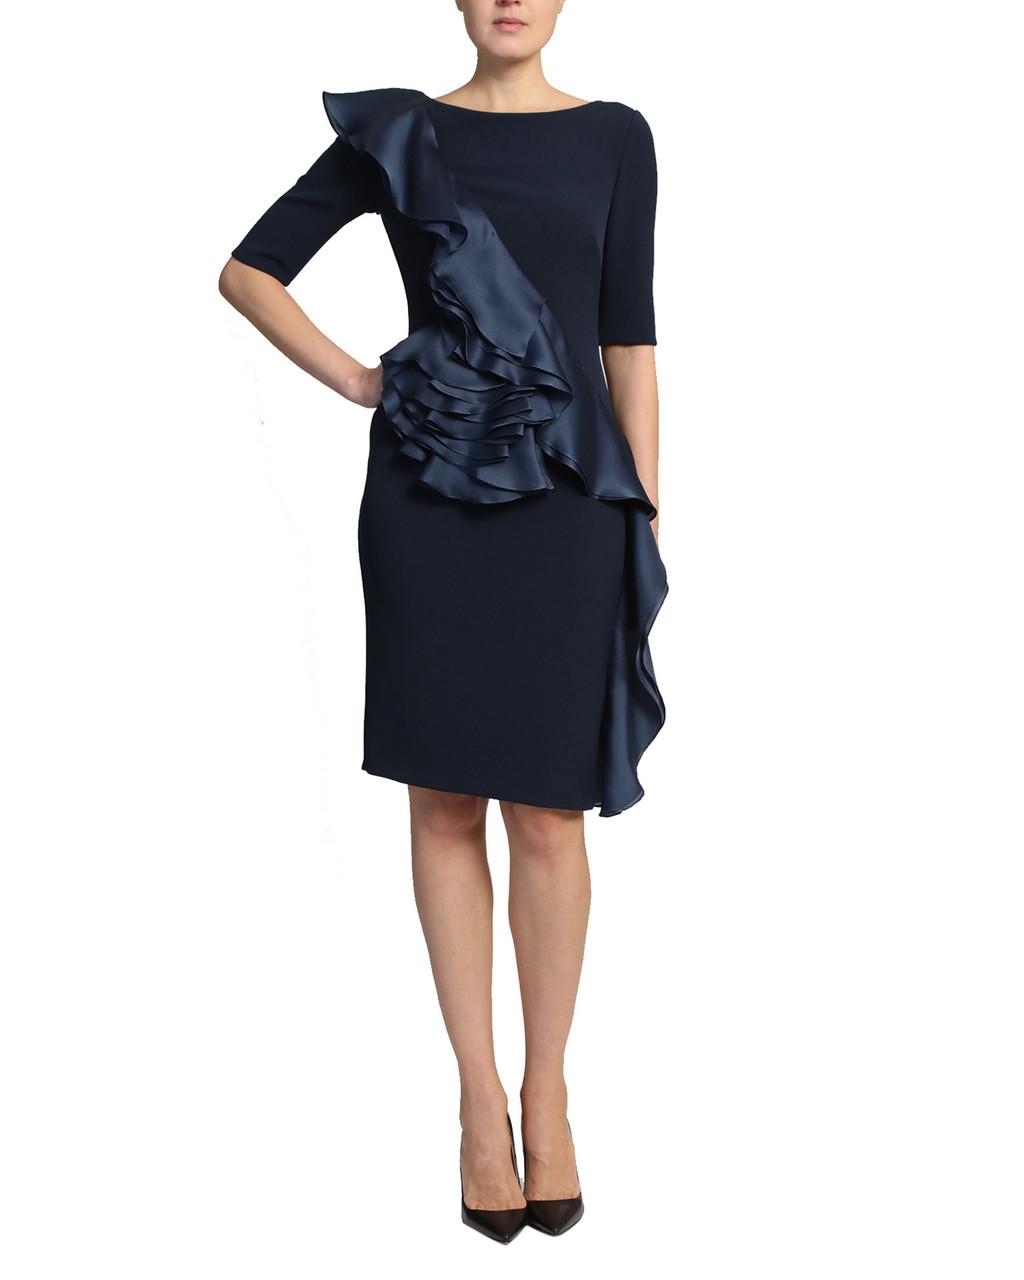 037e472bcf8 Navy Silk Asymmetrical Ruffle Three Quarter Length Sleeve Cocktail Dress